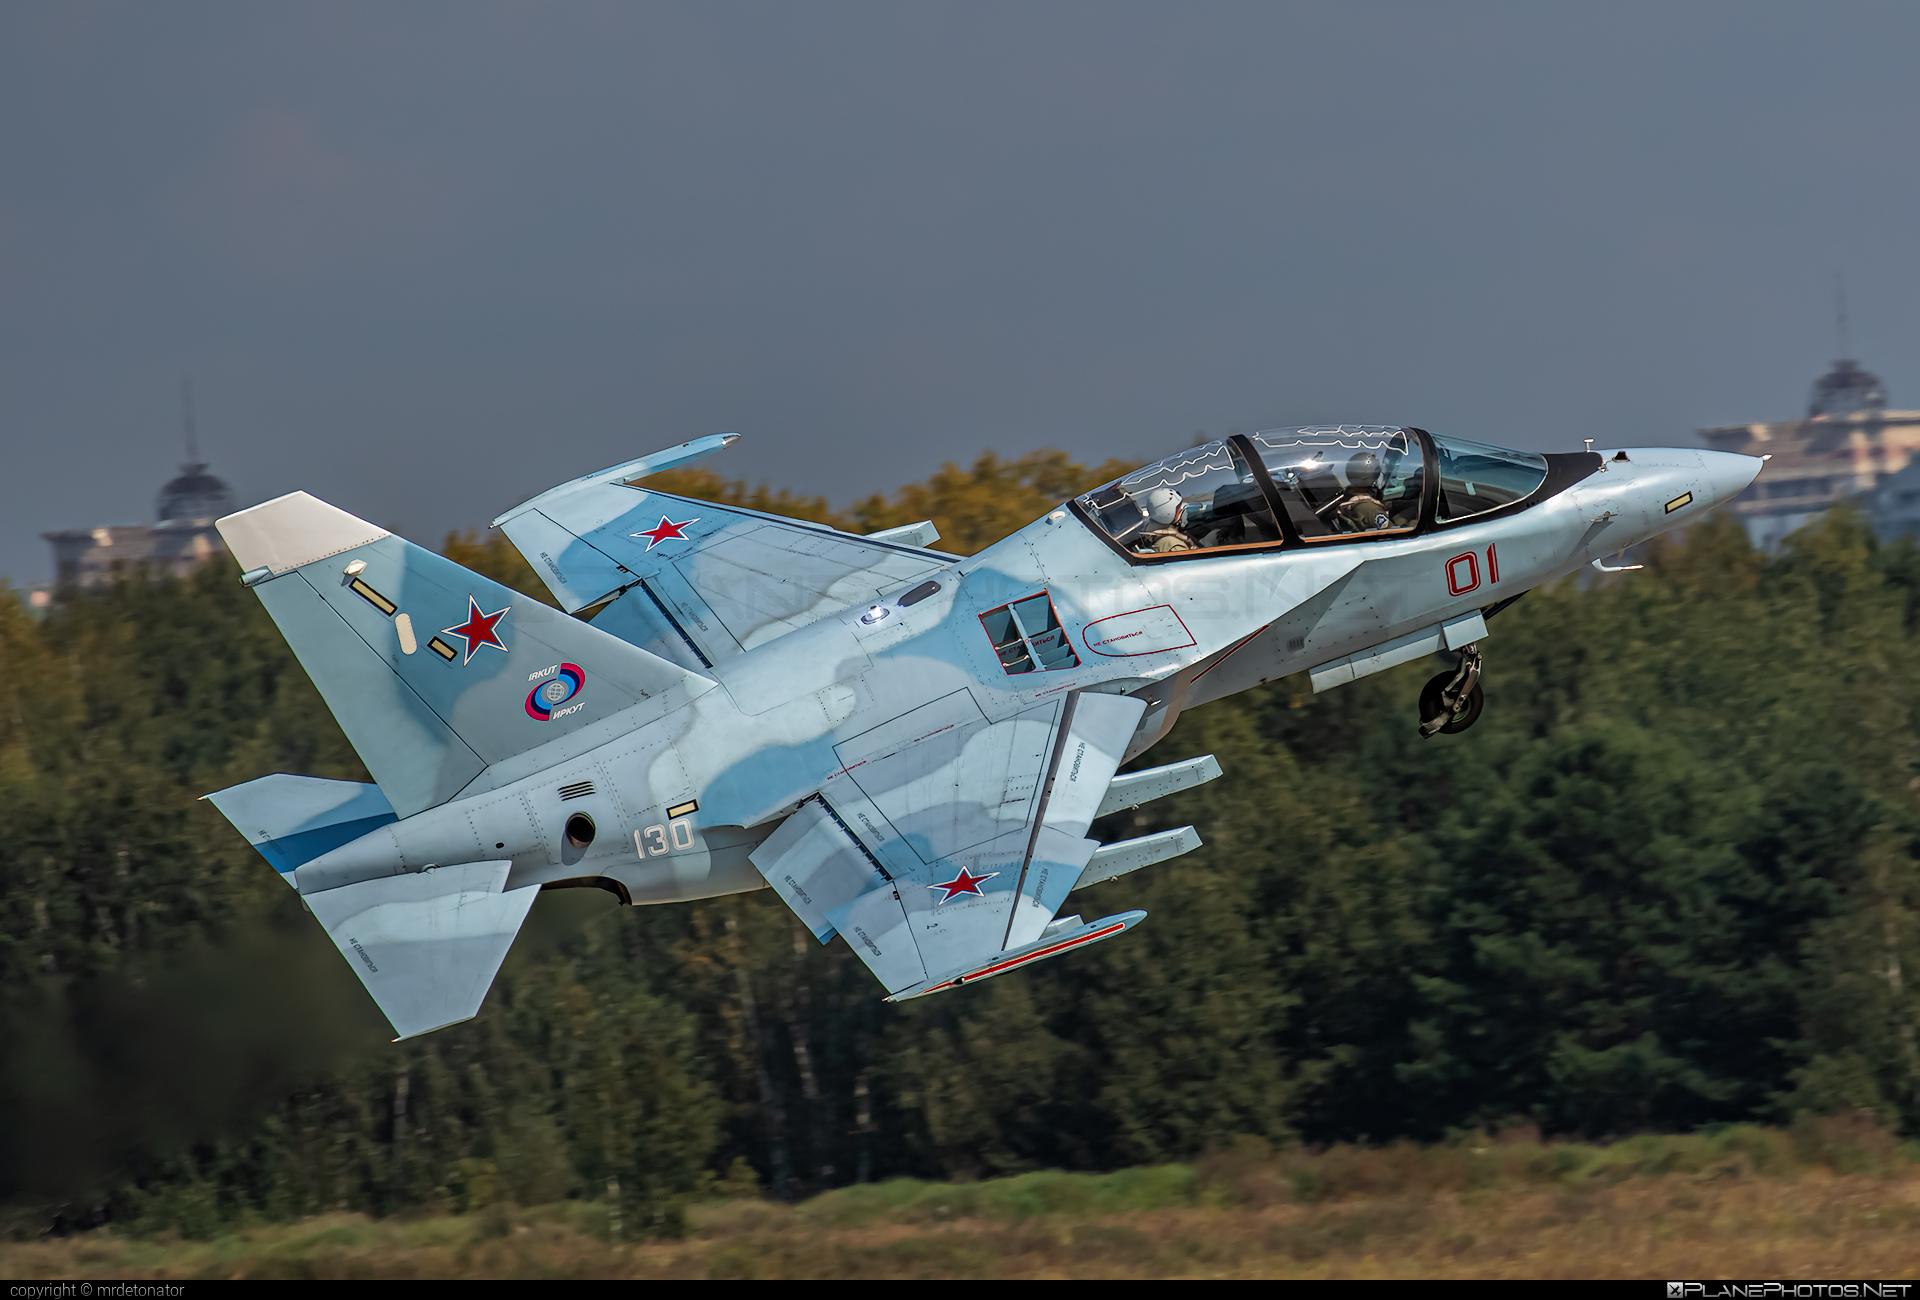 Yakovlev Yak-130 - 01 operated by Yakovlev Design Bureau #maks2019 #yak #yak130 #yakovlev